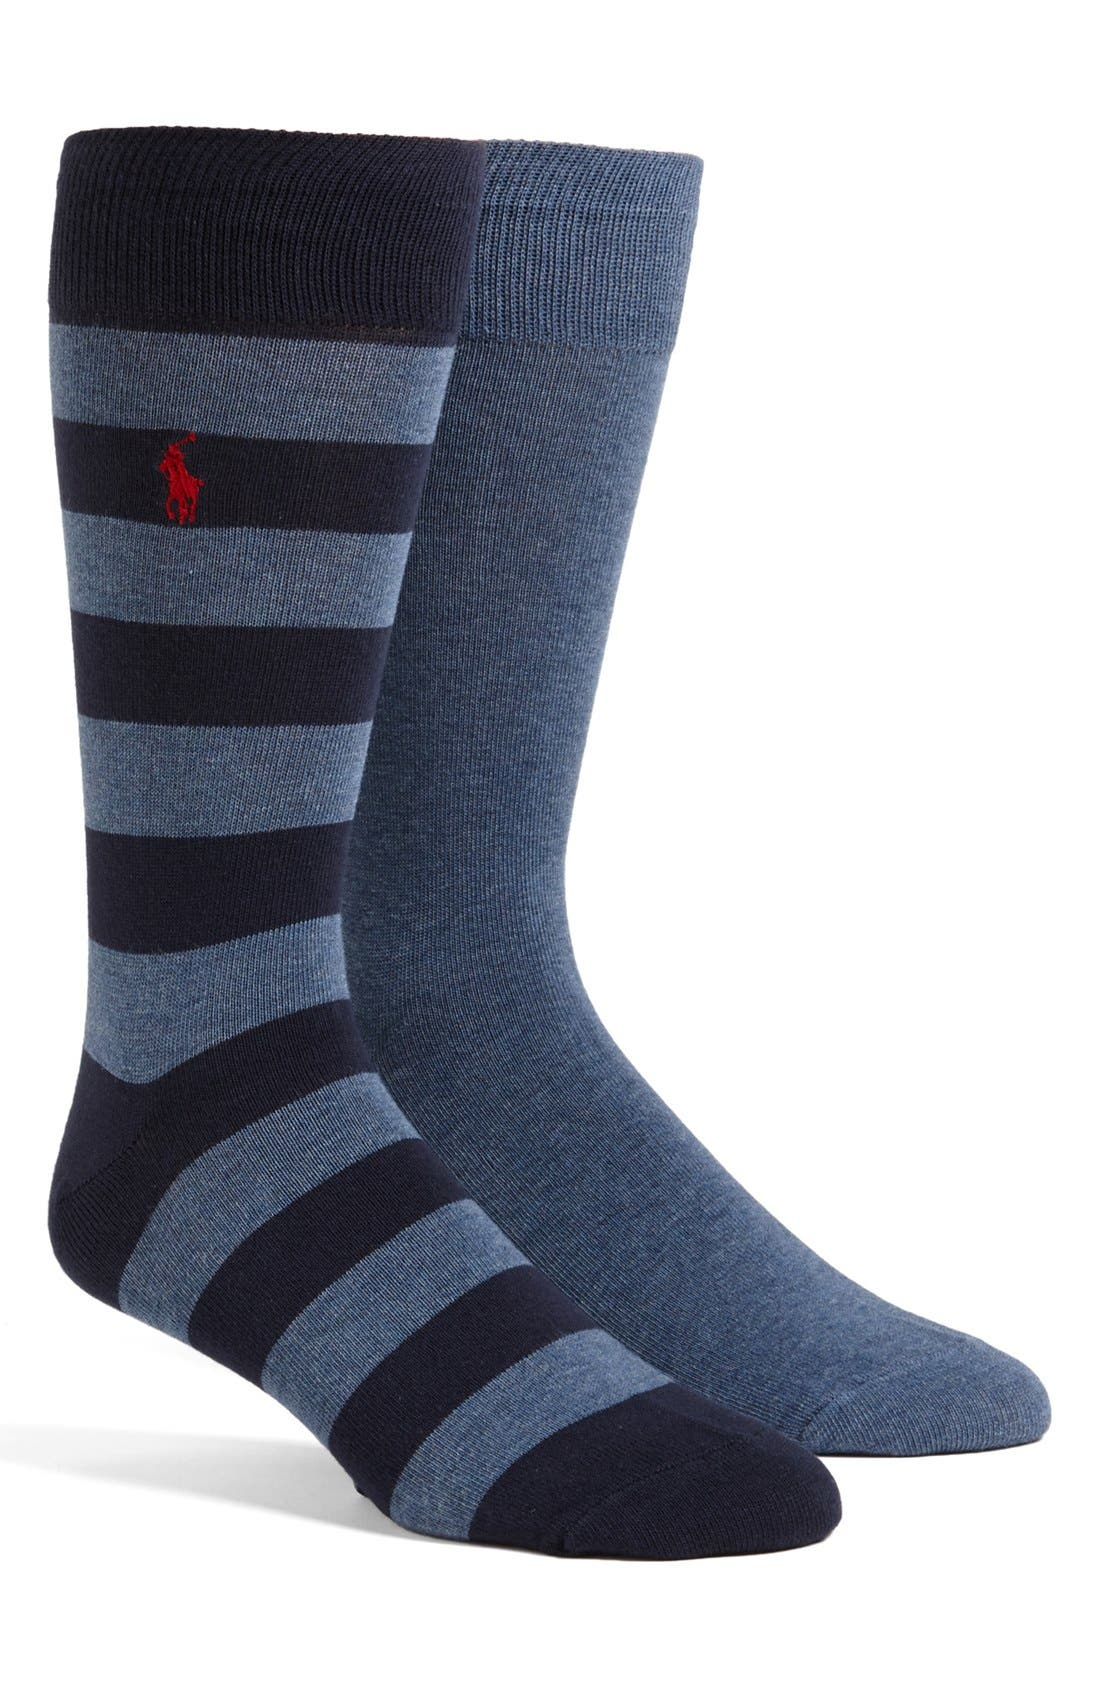 Cotton Blend Socks,                             Main thumbnail 11, color,